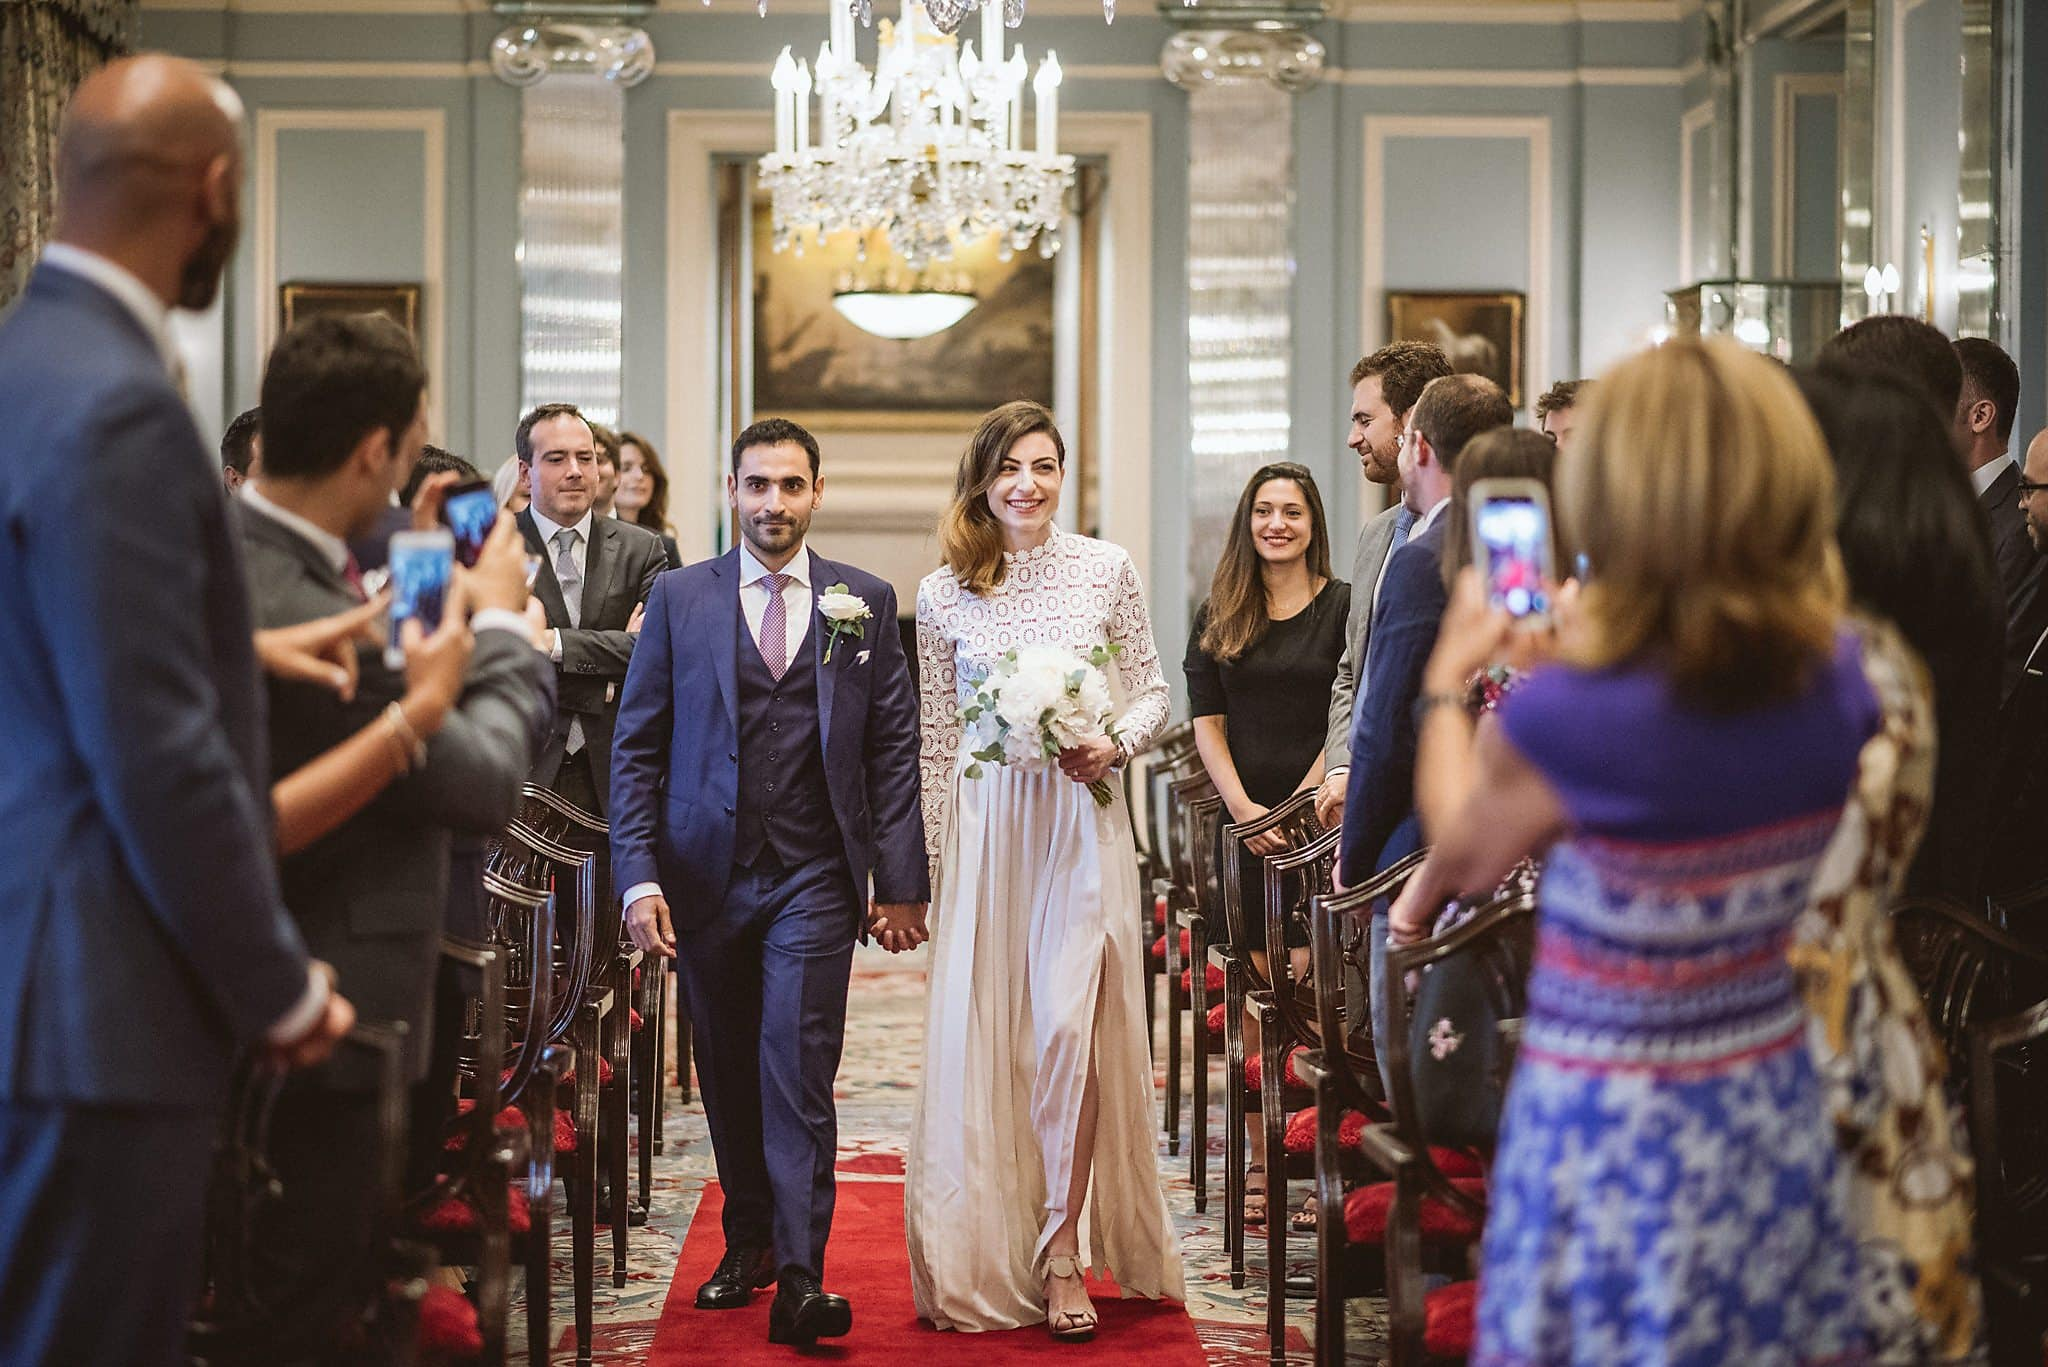 Bride and groom walk down the aisle at their Lanesborough wedding